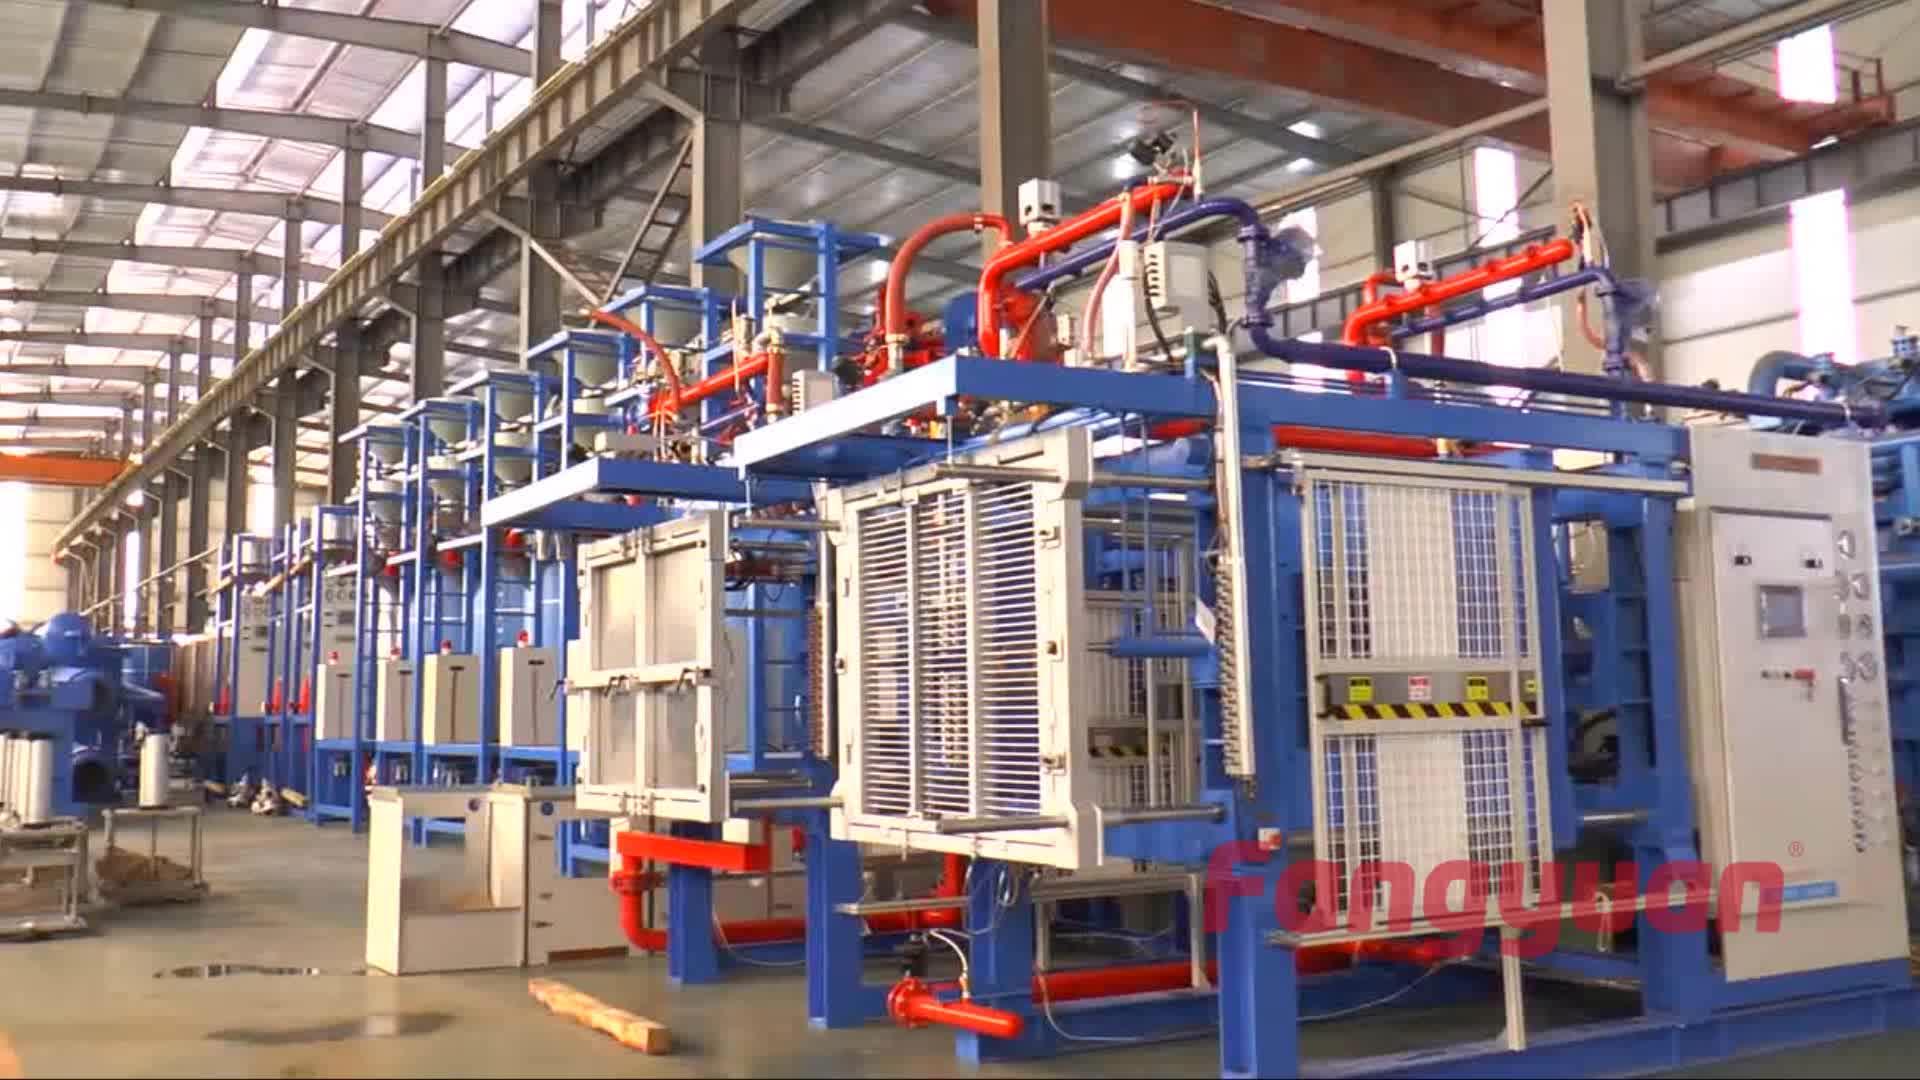 Fangyuan vollautomatische eps schaumbeton steinformmaschine